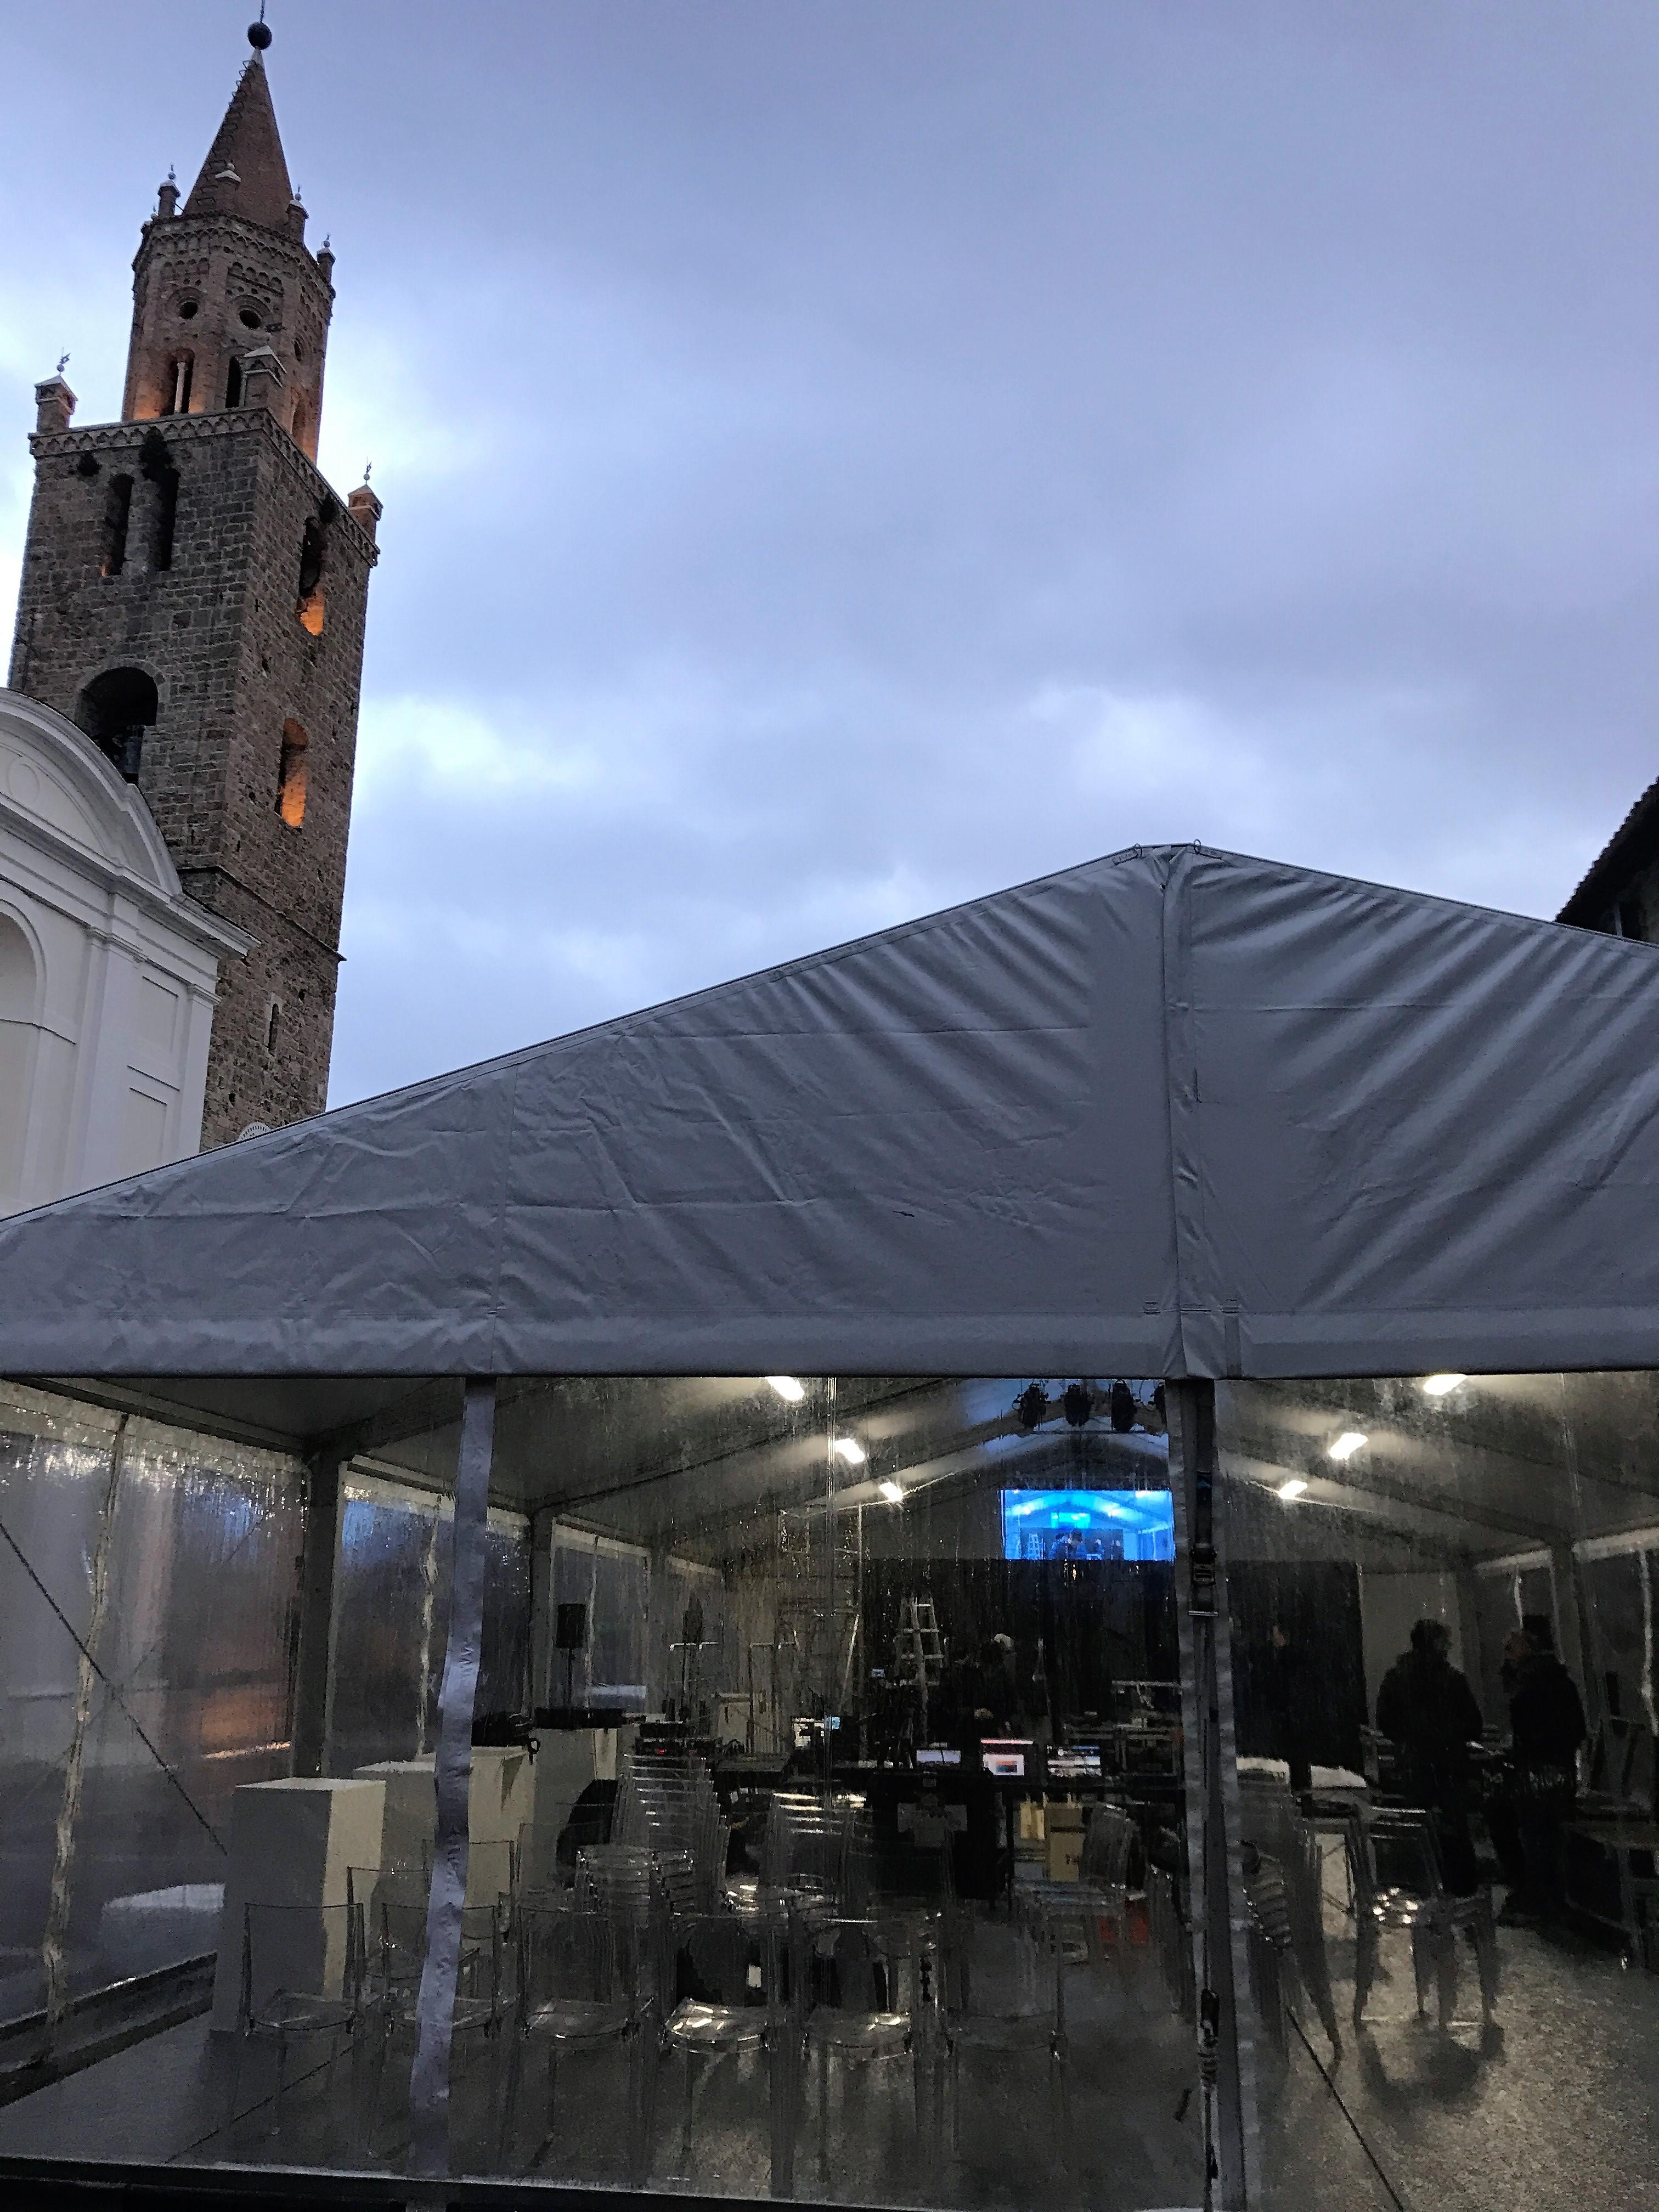 Gentiloni in visita a Campli, allestita tensostruttura